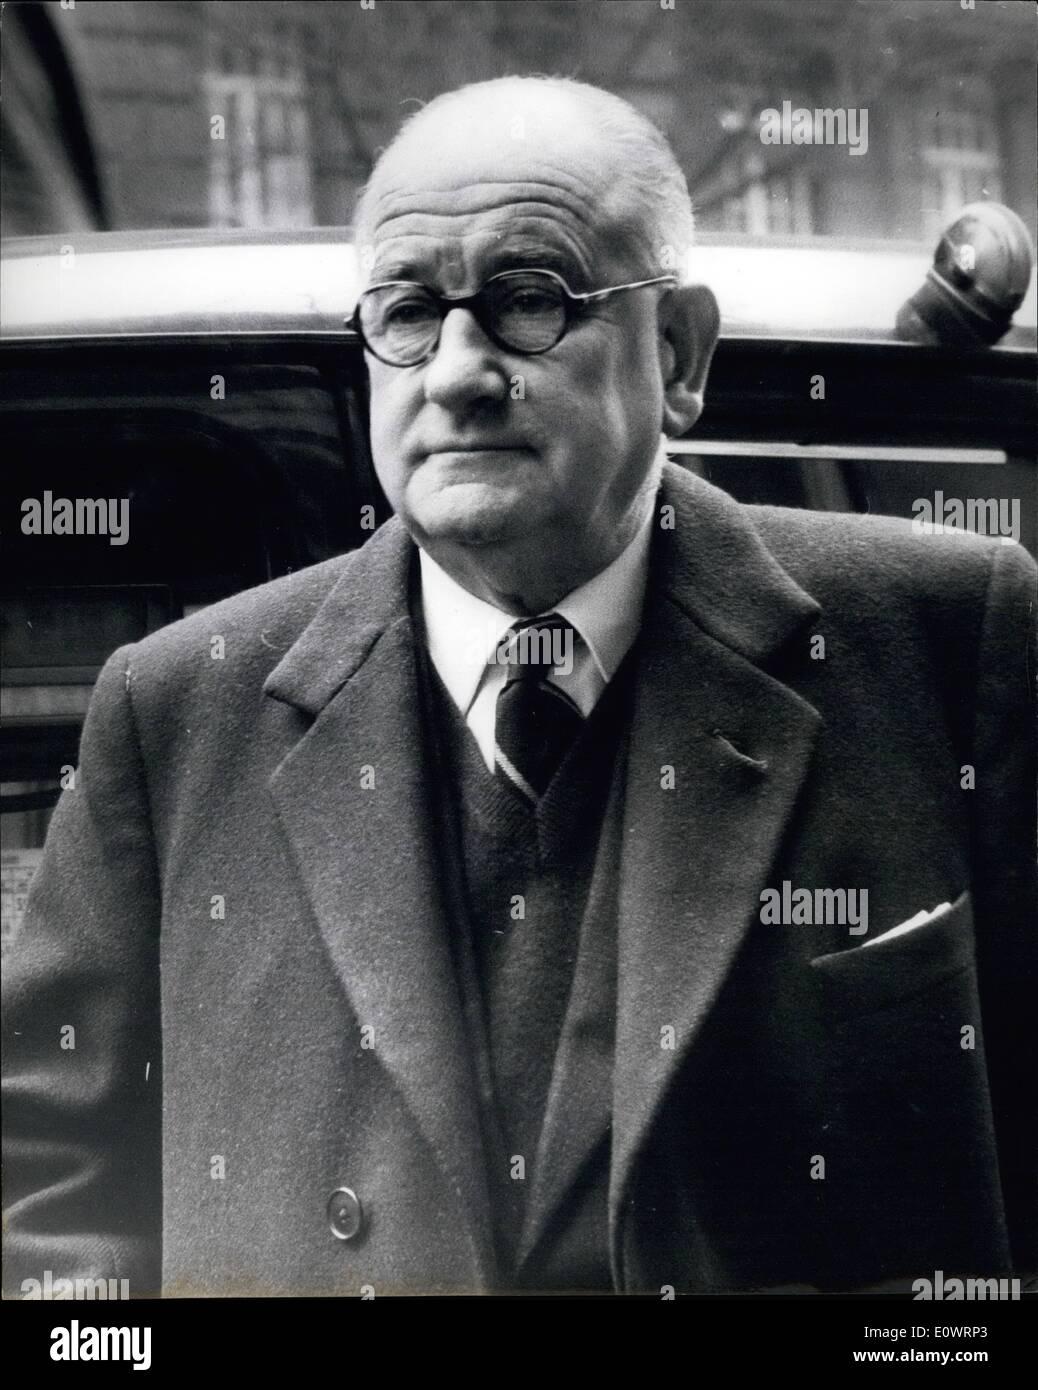 Feb. 02, 1964 - Herbert Wilcox to Make Royal Film: Film chief Herbert Wilcox is to make a film about the life of - Stock Image